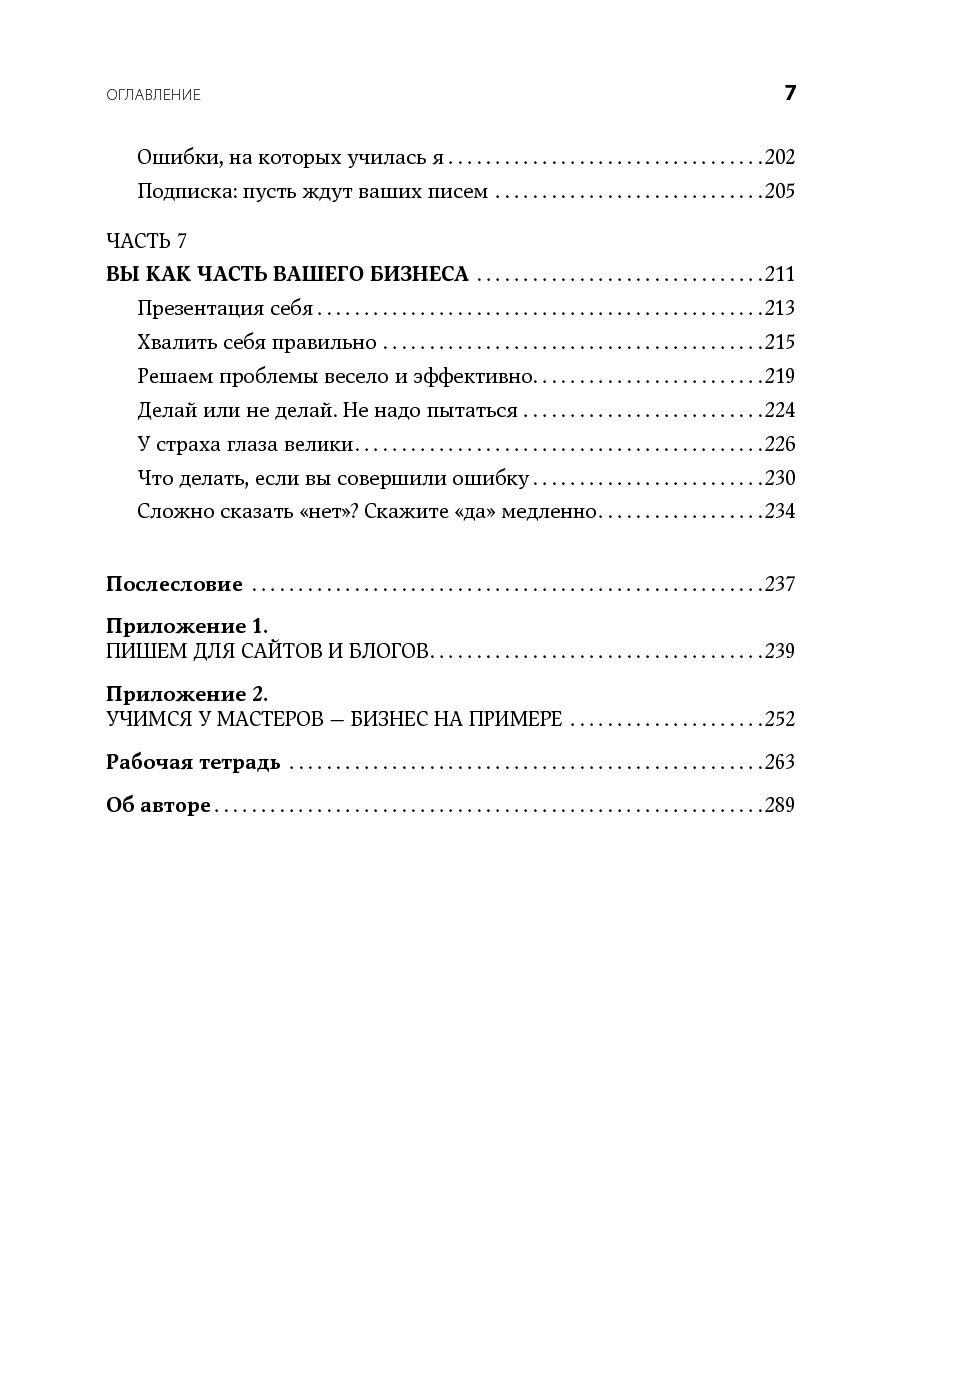 Книга бизнес своими руками 725